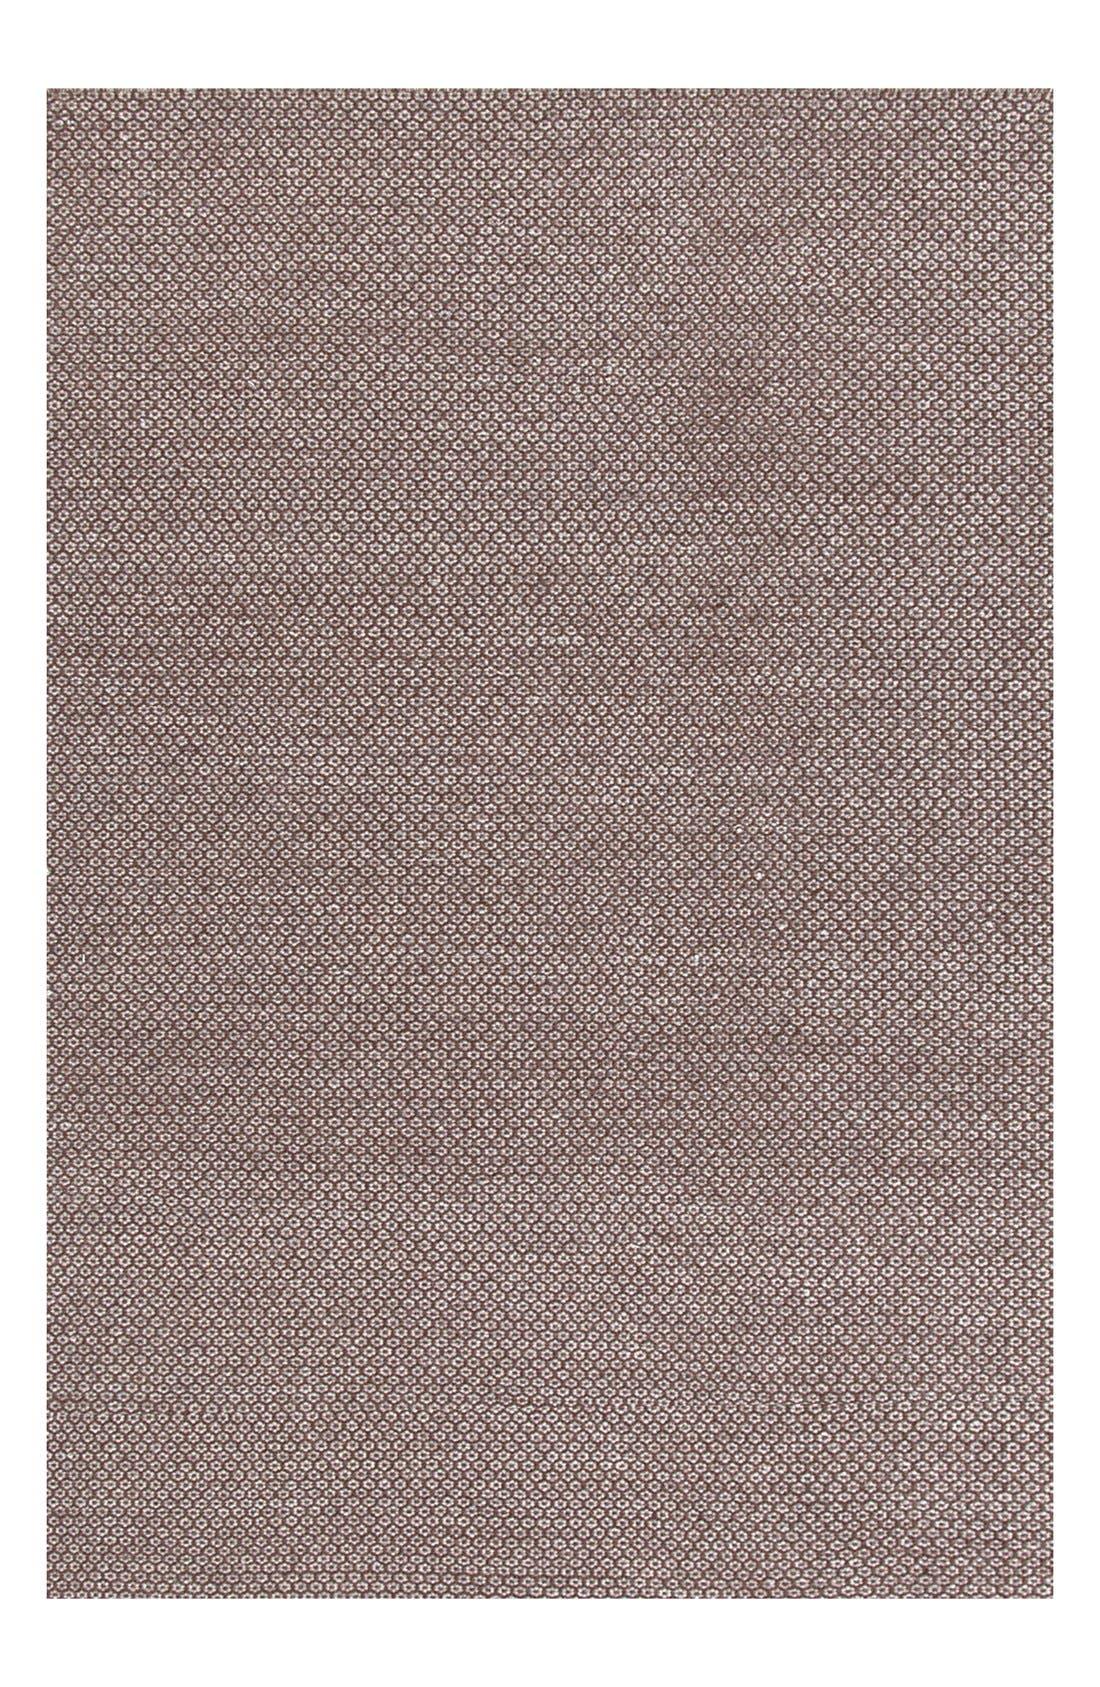 Alternate Image 1 Selected - Dash & Albert 'Honeycomb' Wool Rug